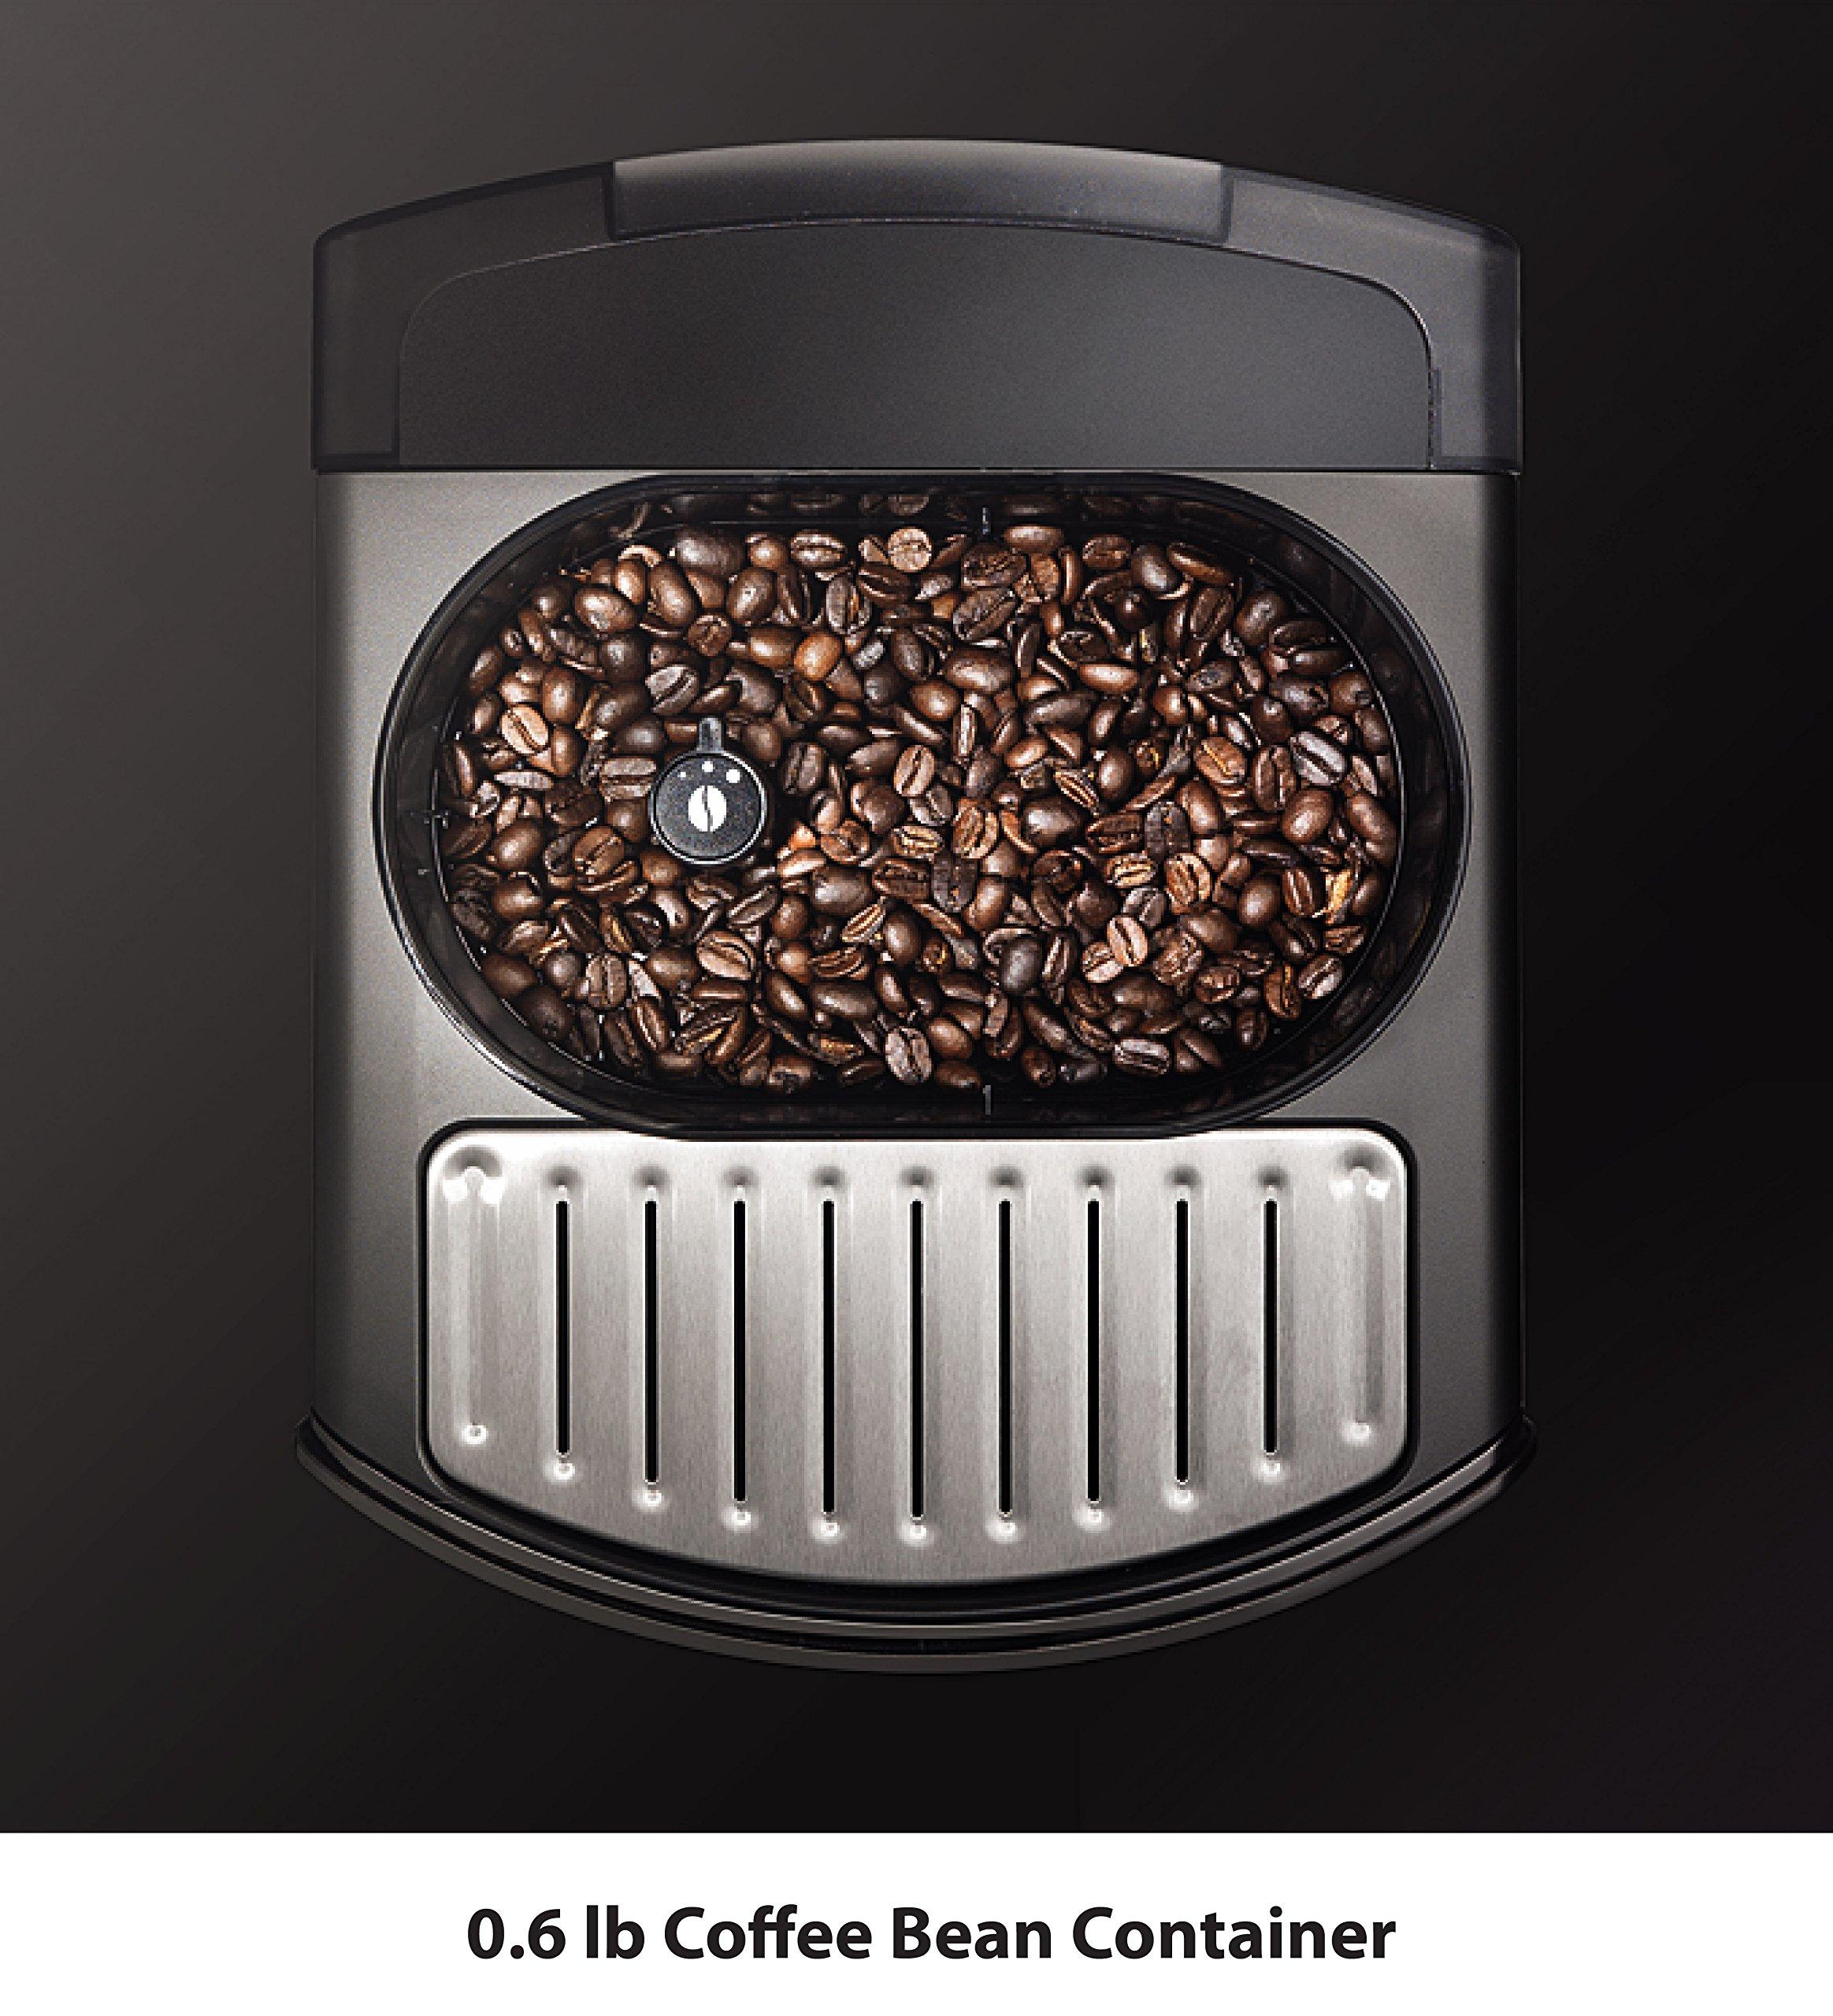 KRUPS EA8250 Fully Auto Espresso Machine, Espresso Maker, Burr Grinder, 60 Ounce, Black by KRUPS